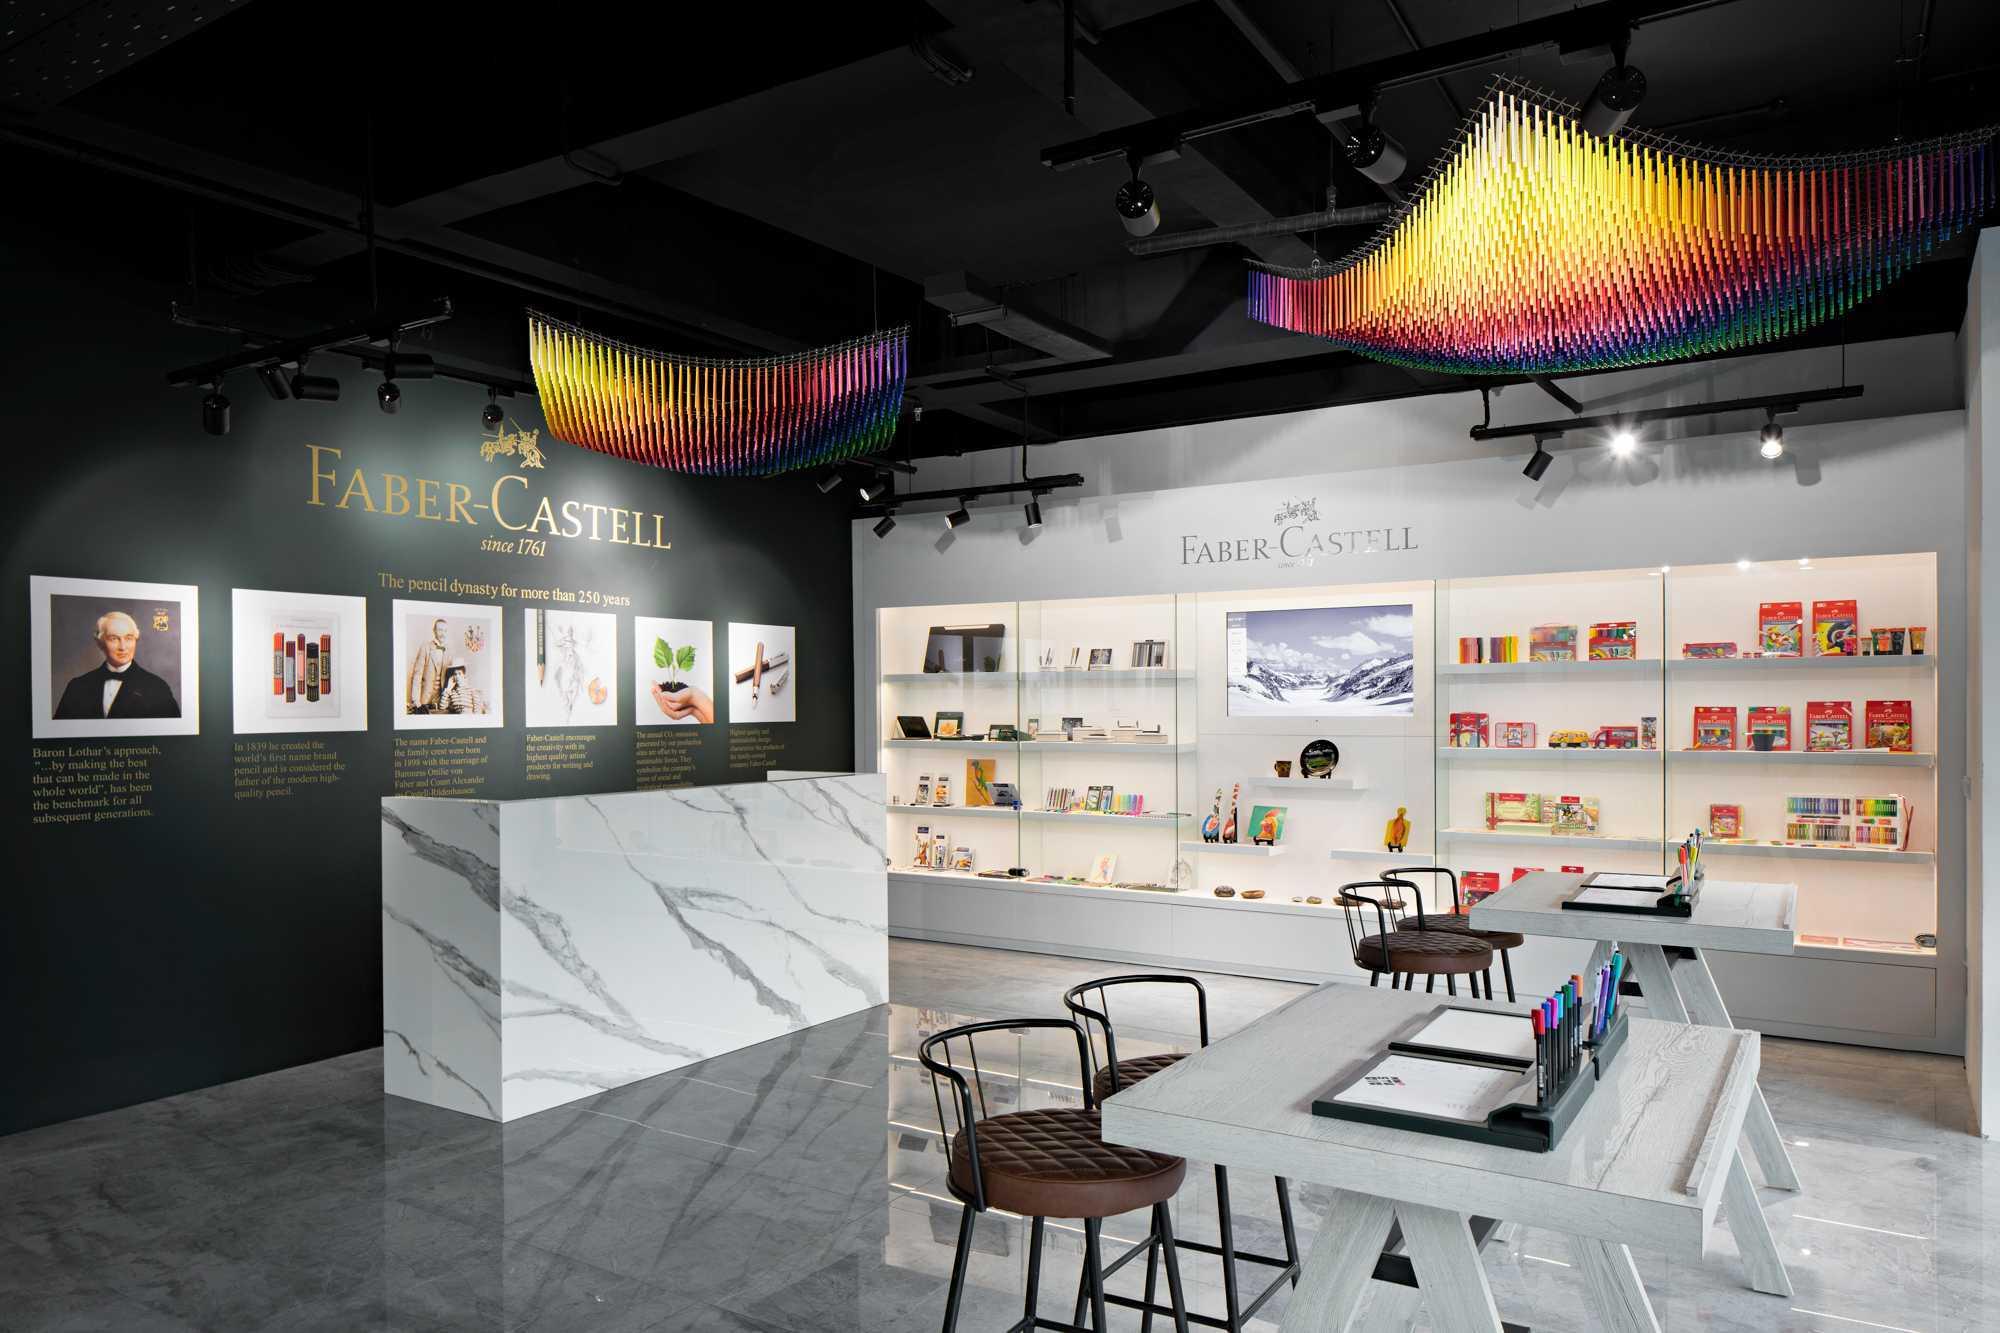 Best Group Design Studio Faber Castell International - Surabaya Surabaya, Kota Sby, Jawa Timur, Indonesia Surabaya, Kota Sby, Jawa Timur, Indonesia Best-Group-Design-Studio-Faber-Castell-International-Surabaya  88494